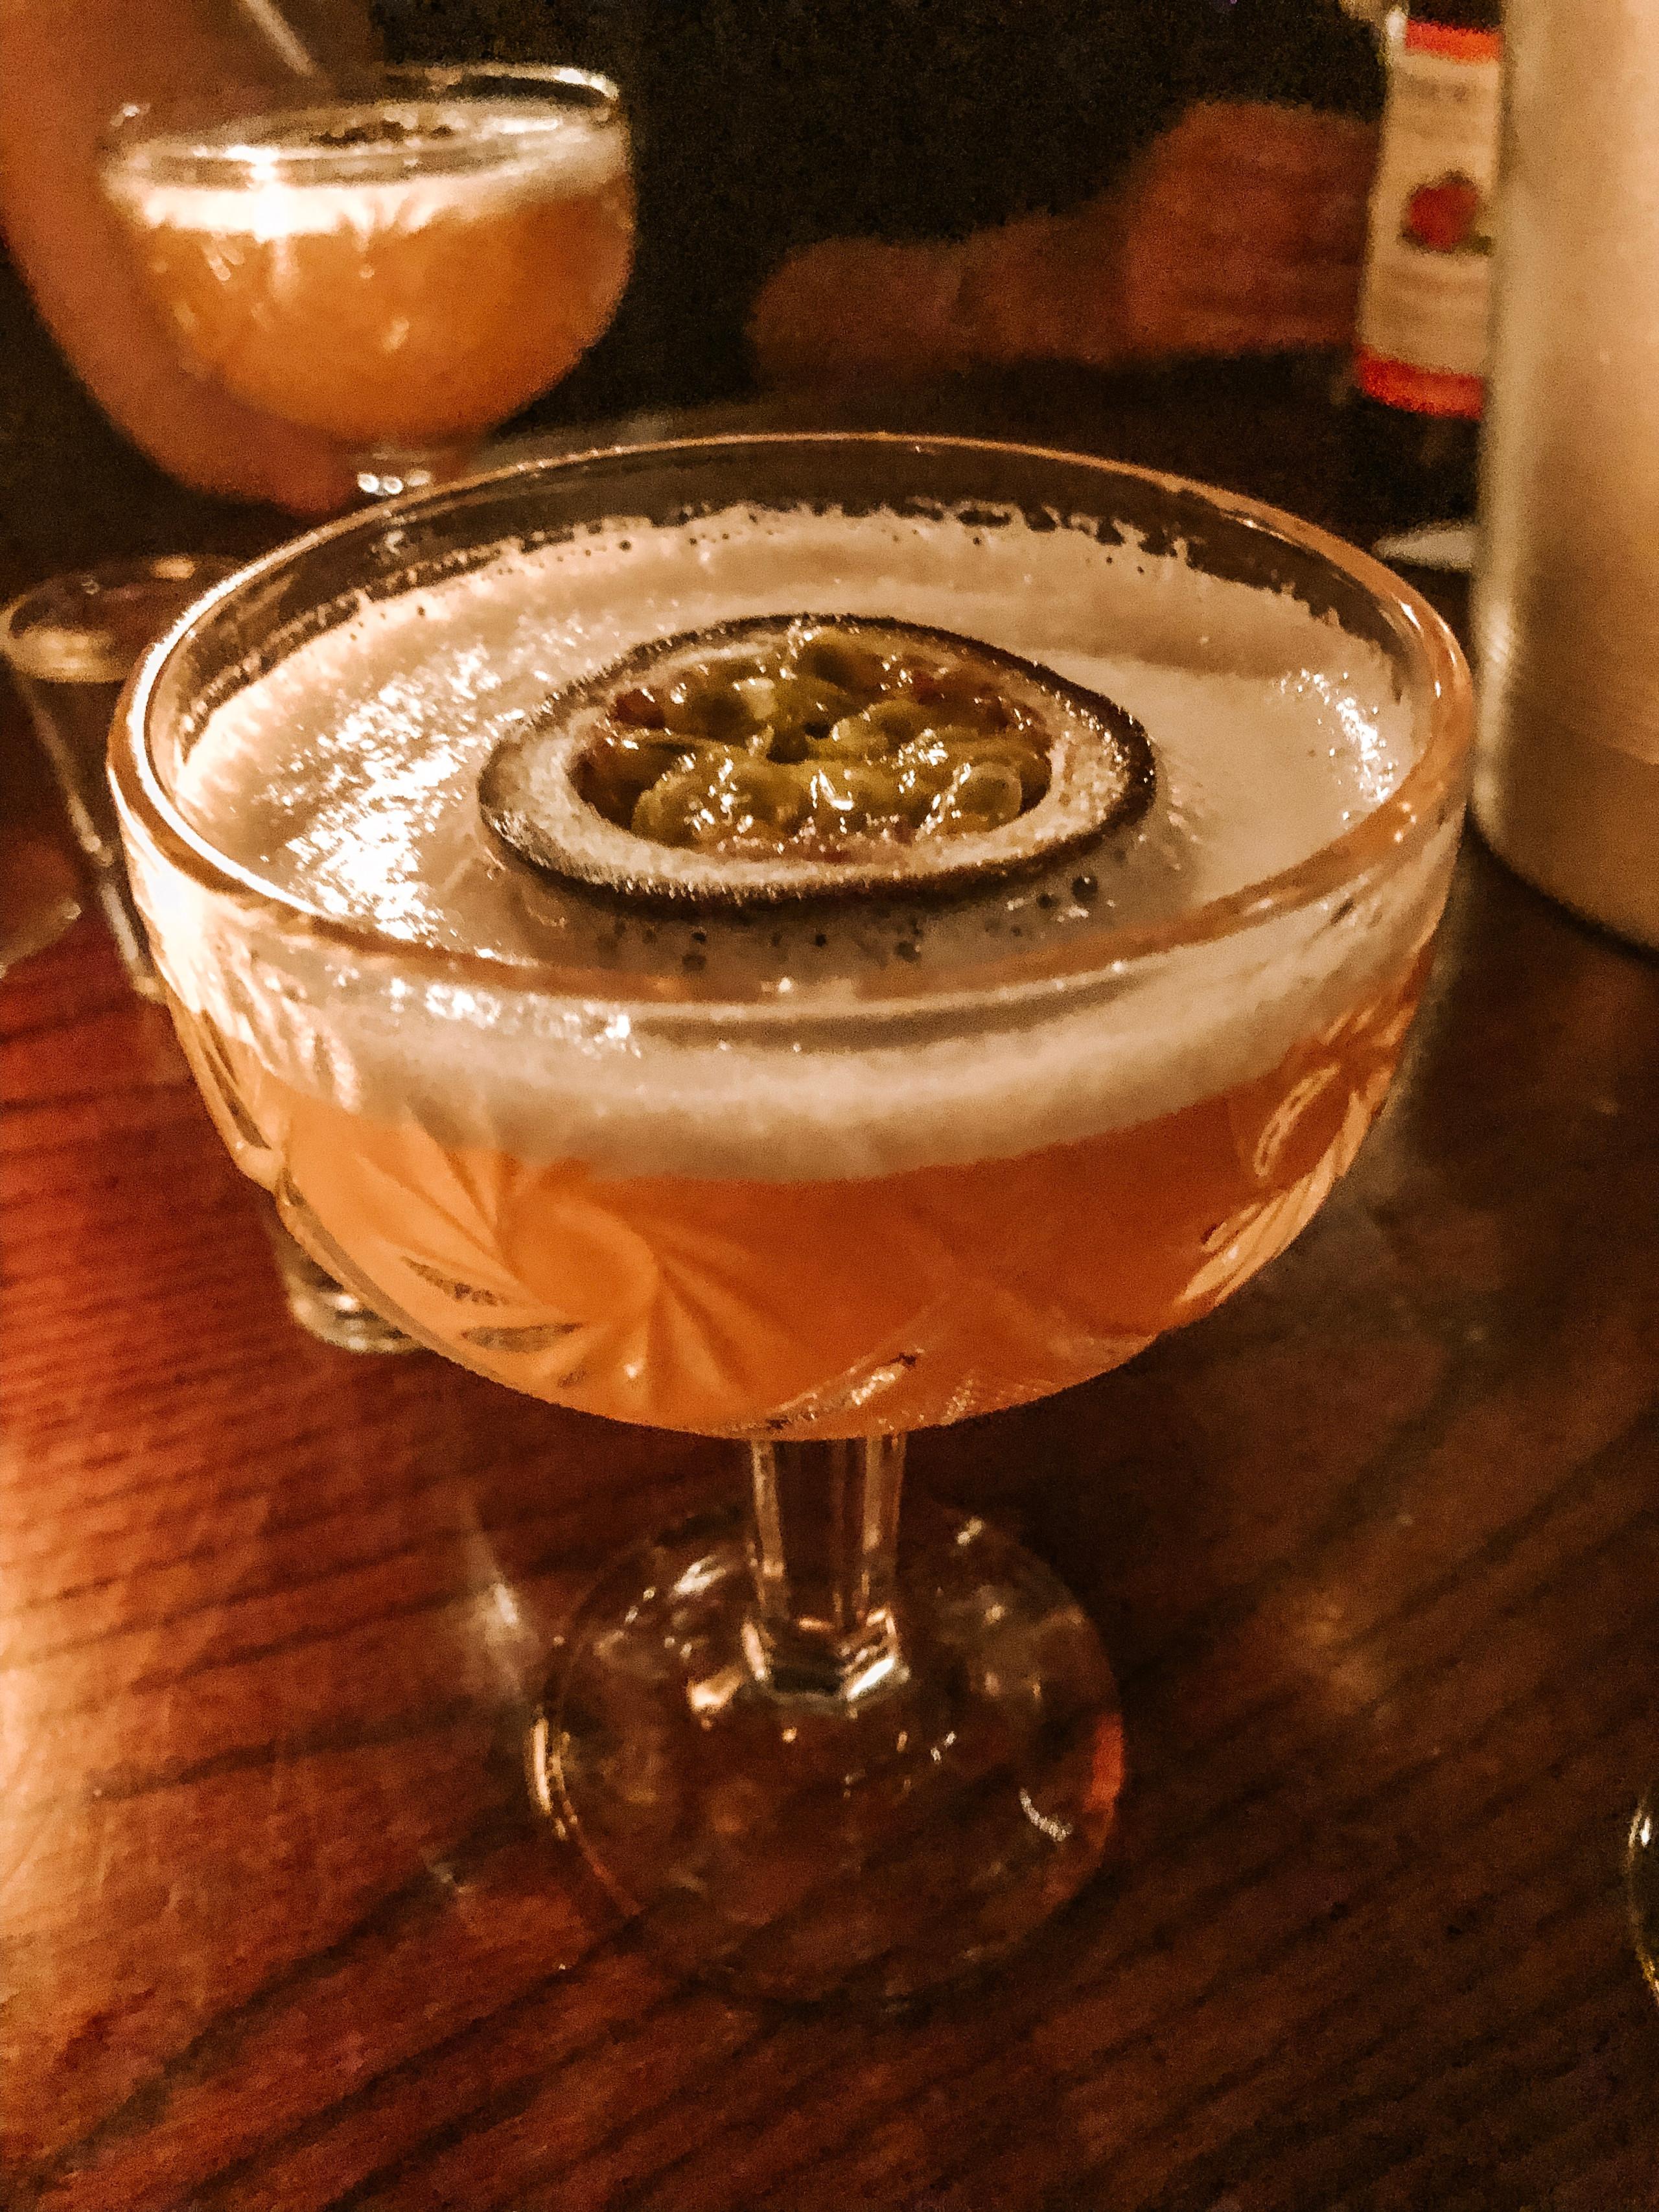 Porn star martini Fitzgeralds jazz lounge northern quarter manchester